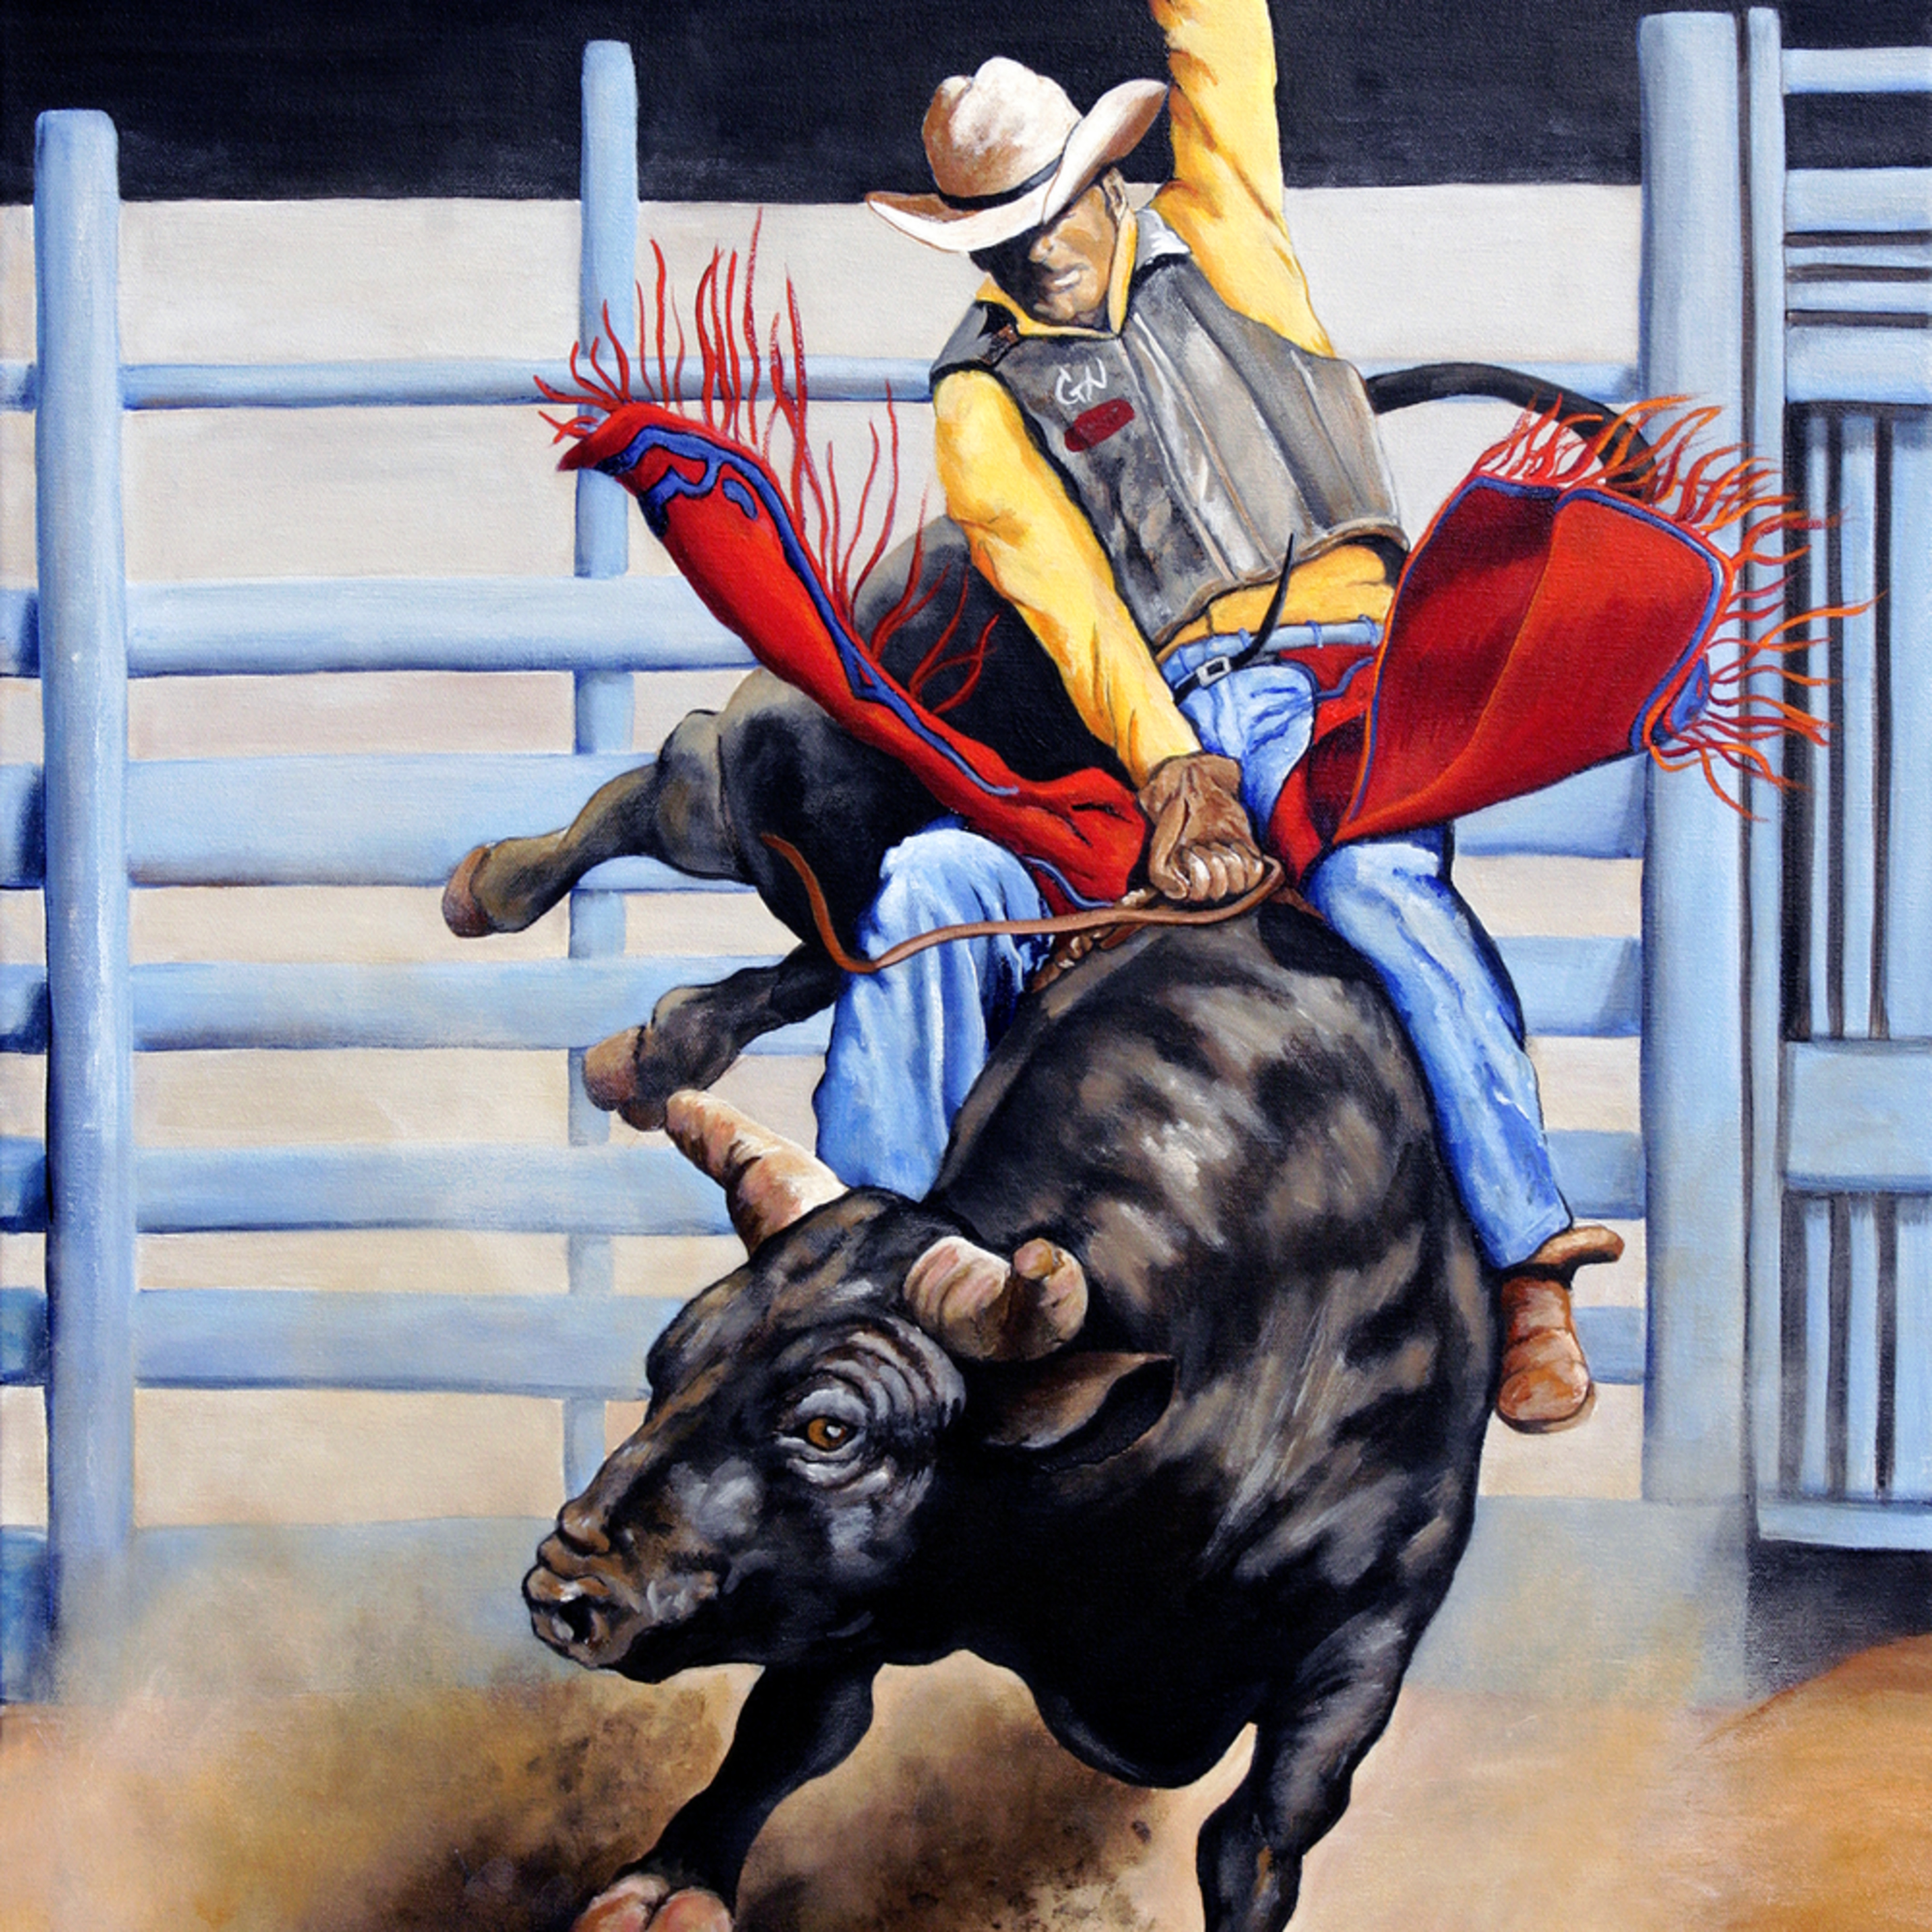 Bull rider e1seai